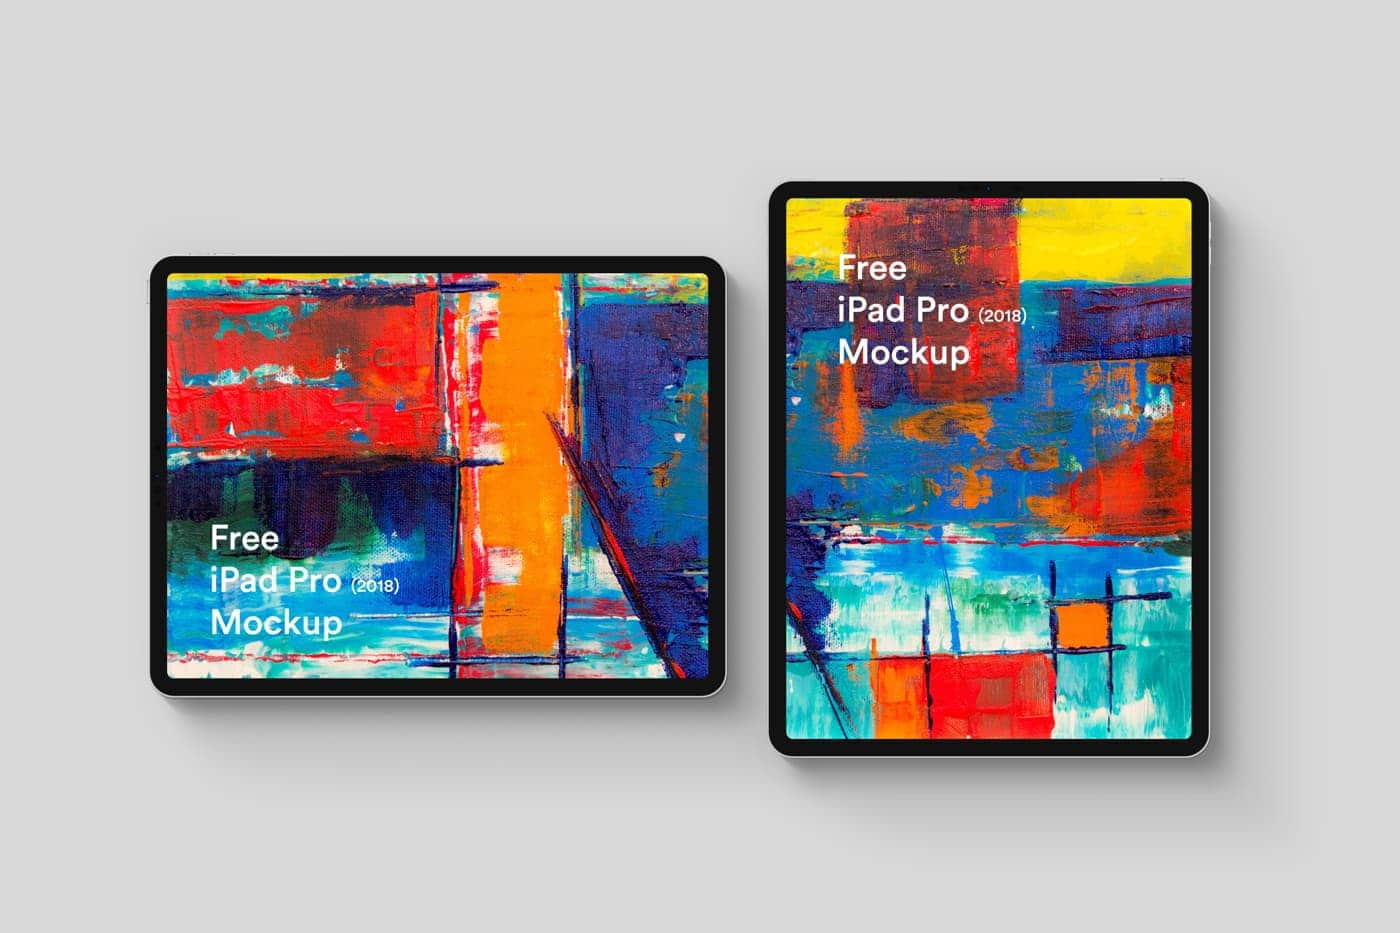 Free iPad Pro 2018 Mockup from UIGarage